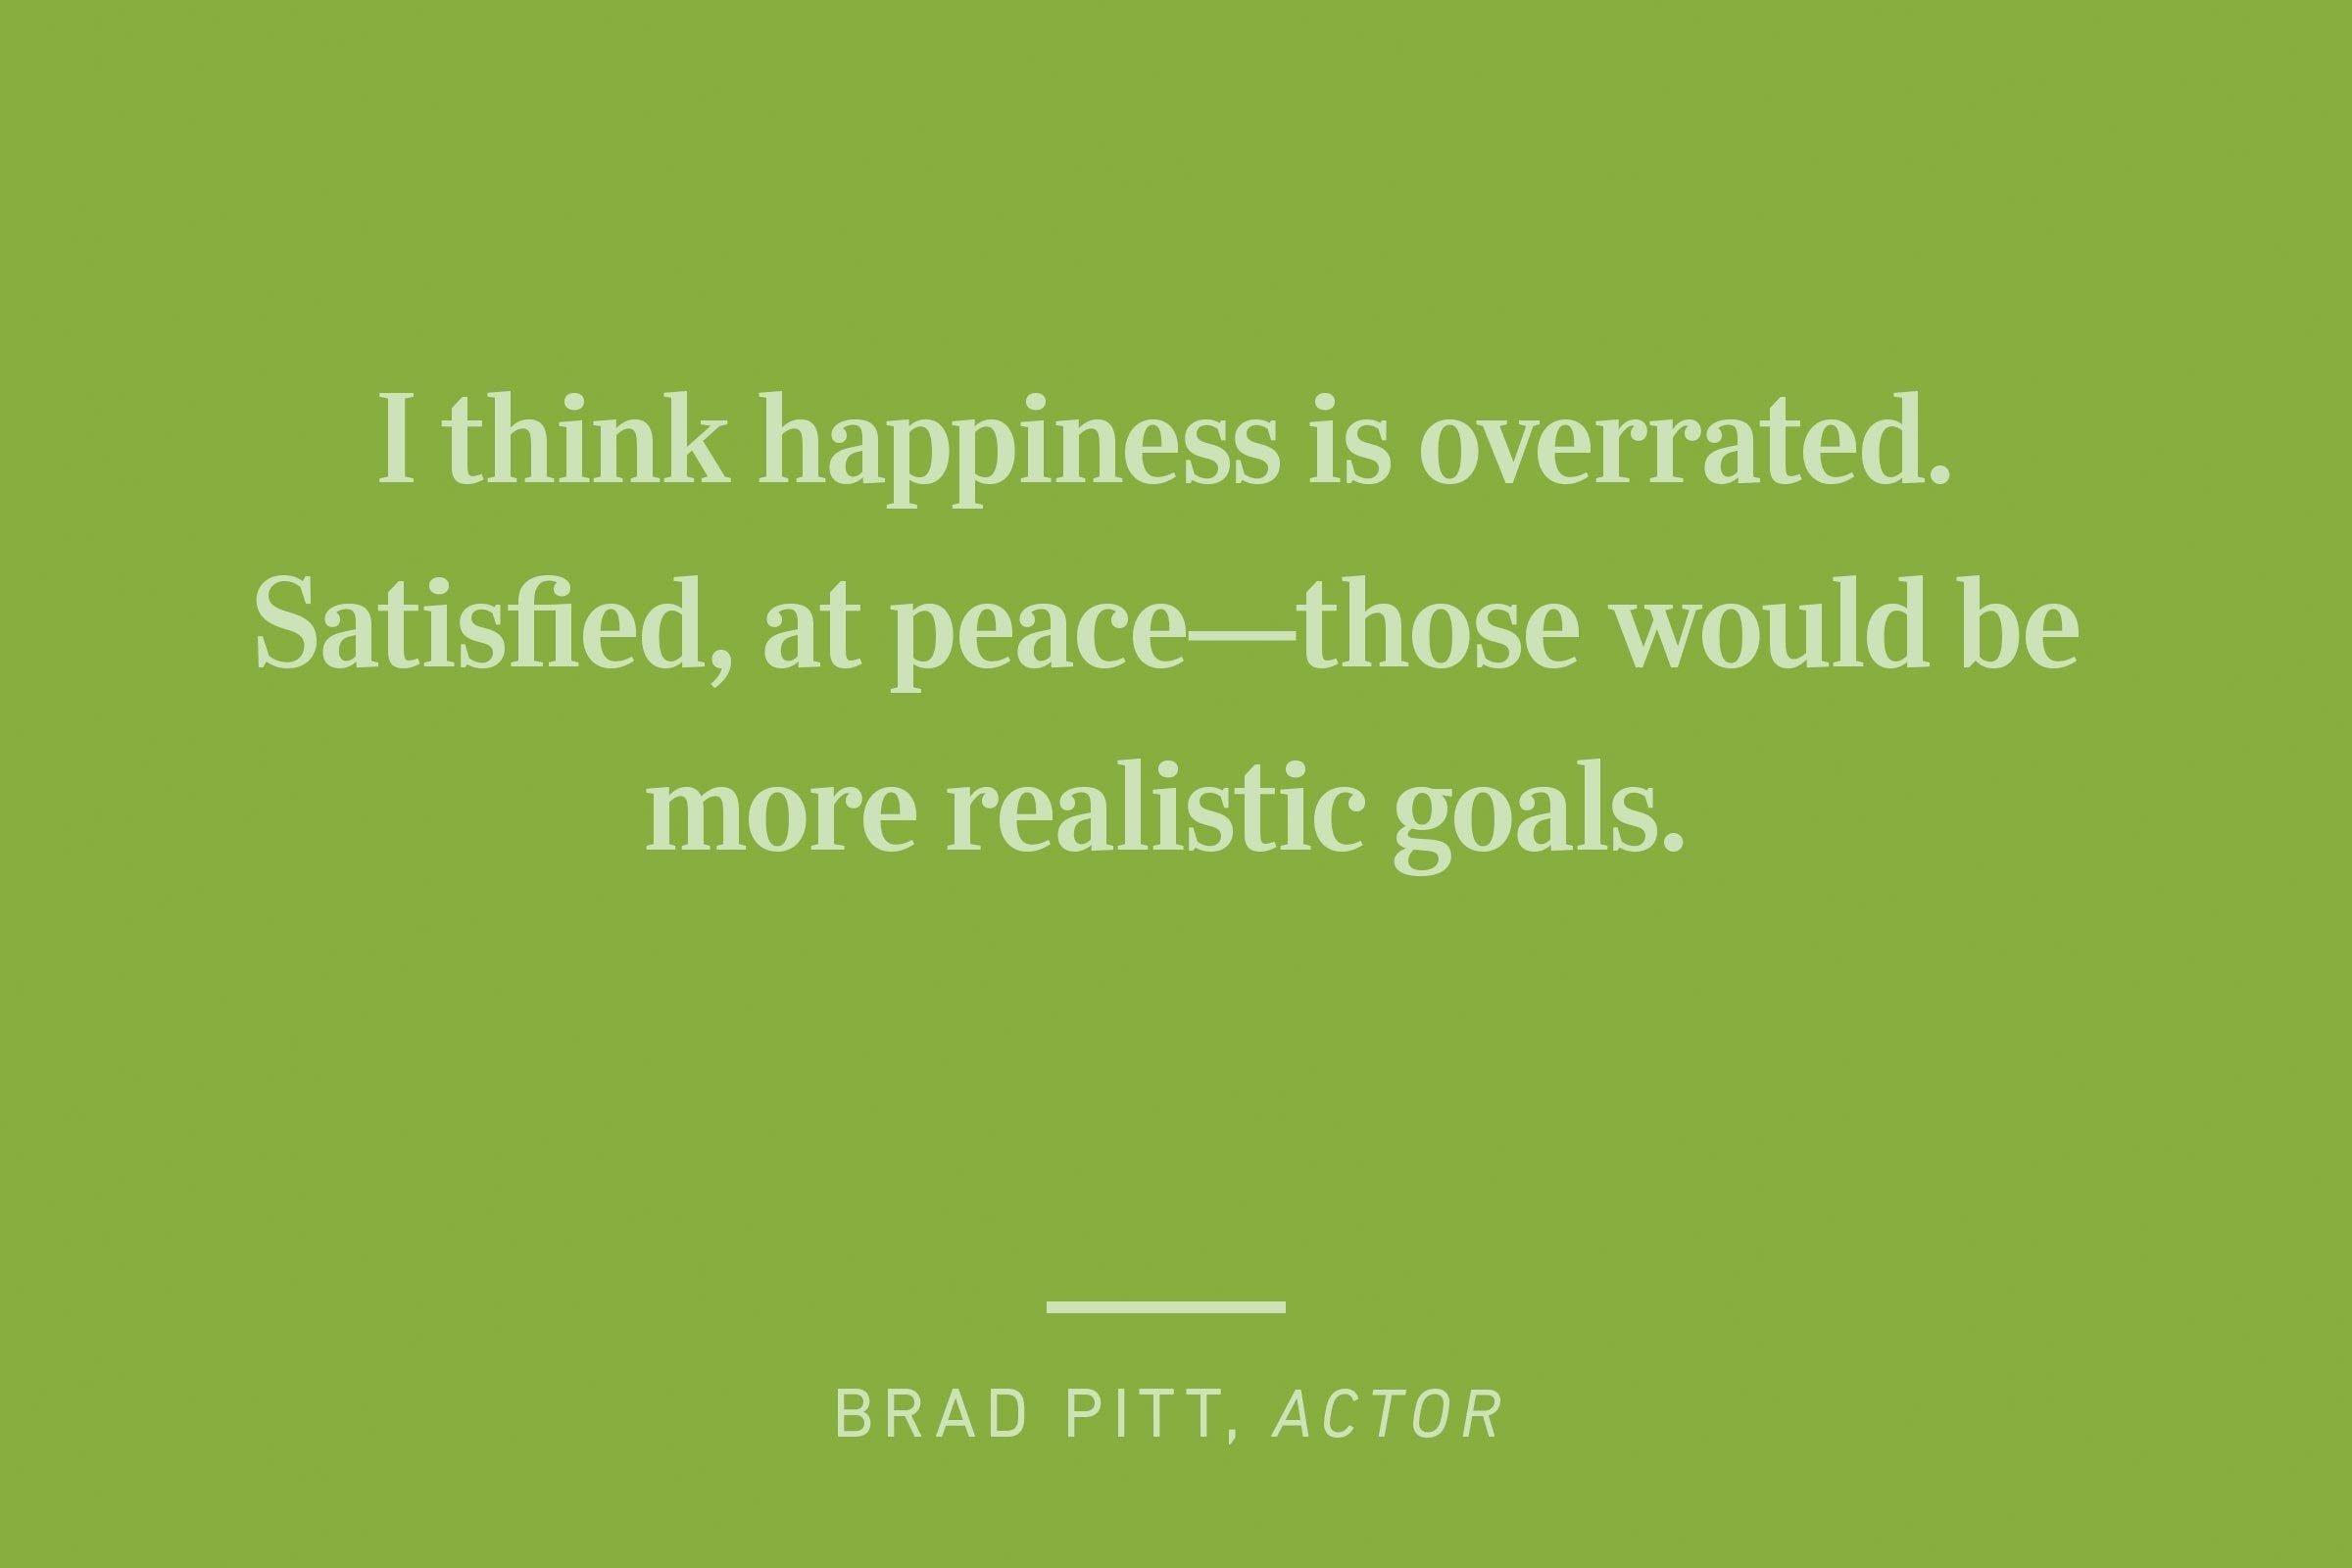 brad pitt happiness quote